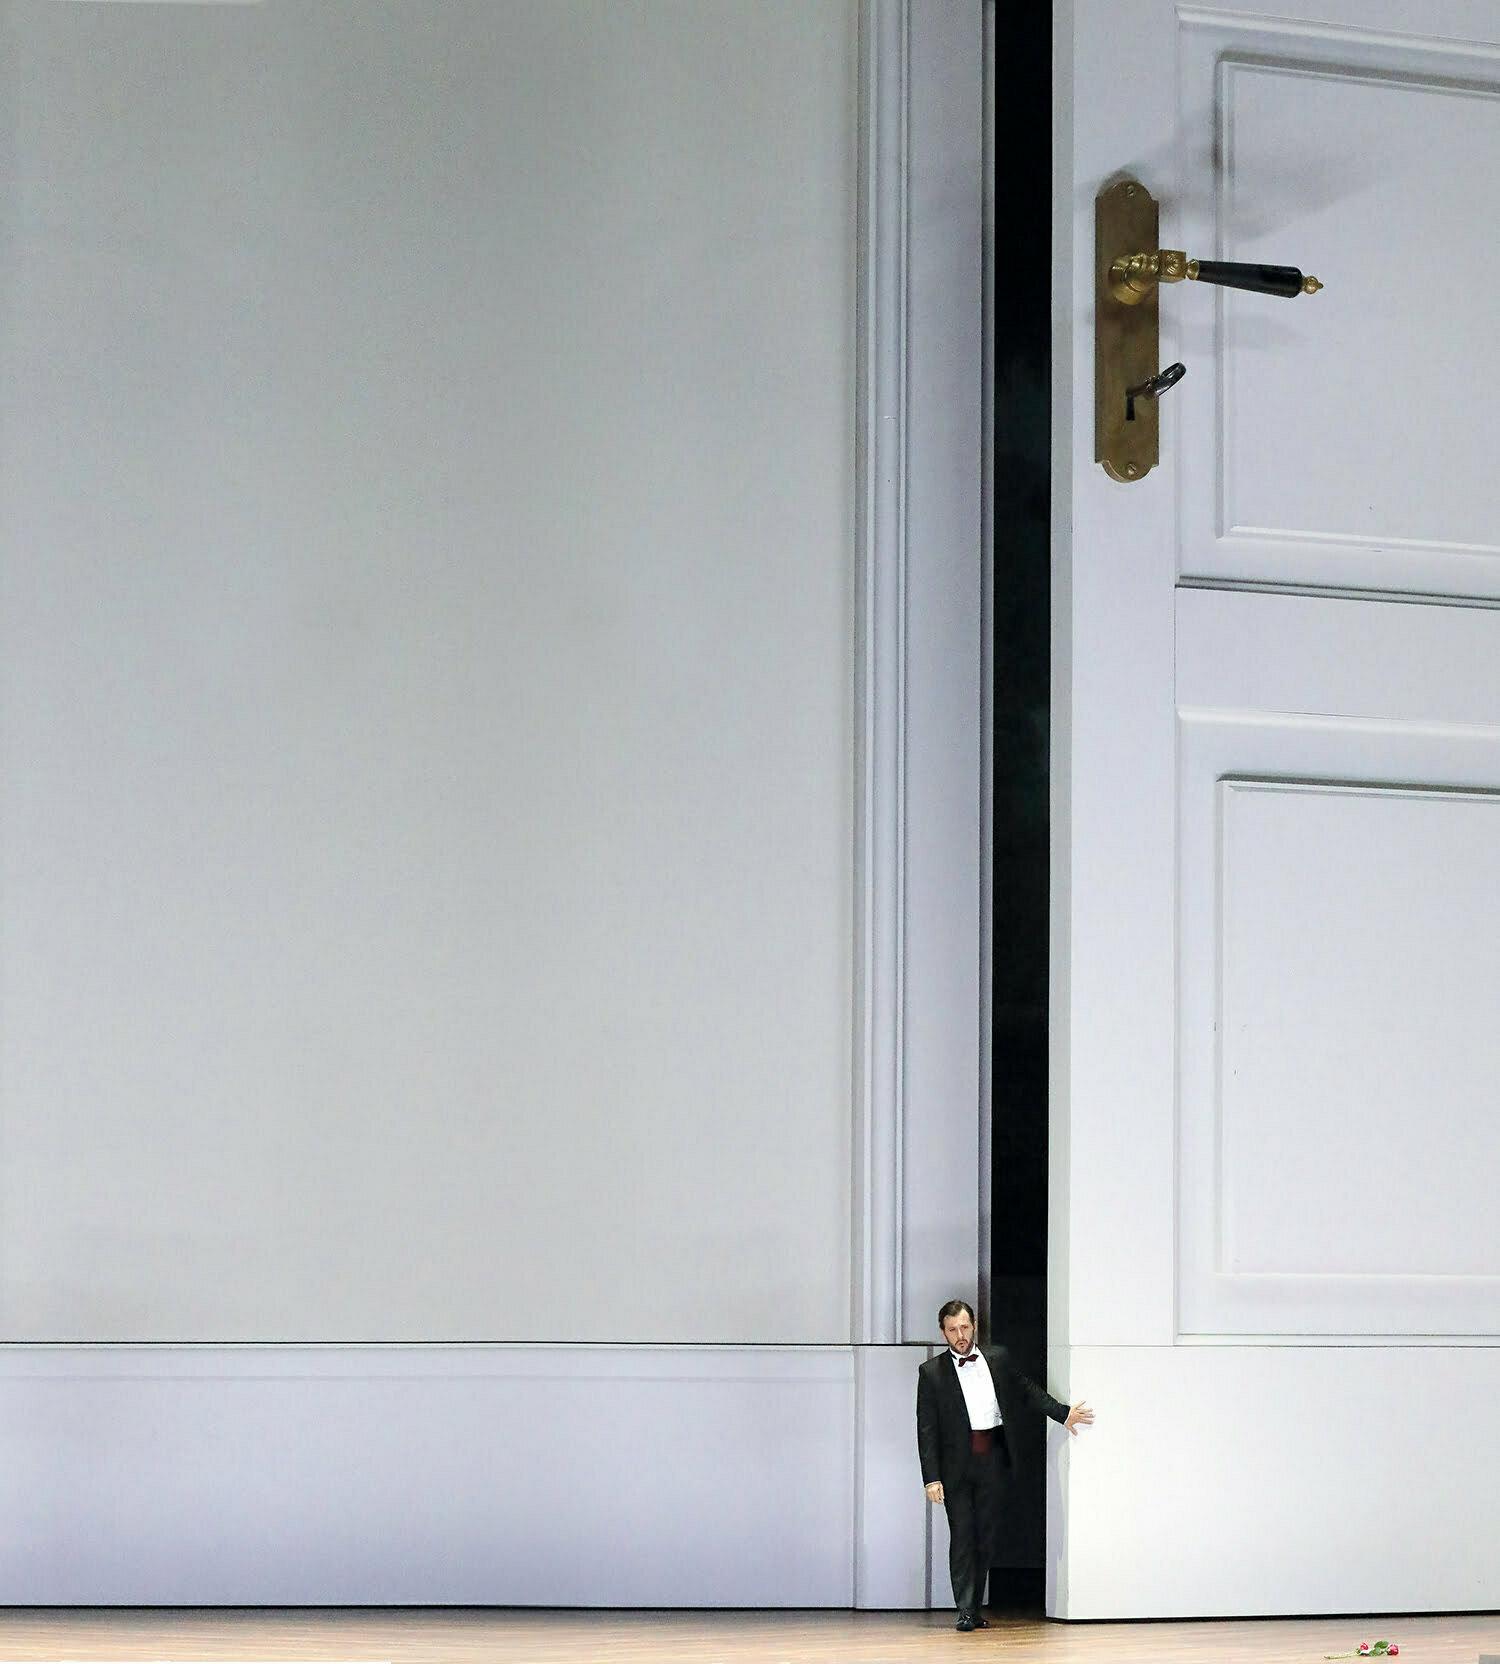 Le nozze di Figaro an der Bayerischen Staatsoper